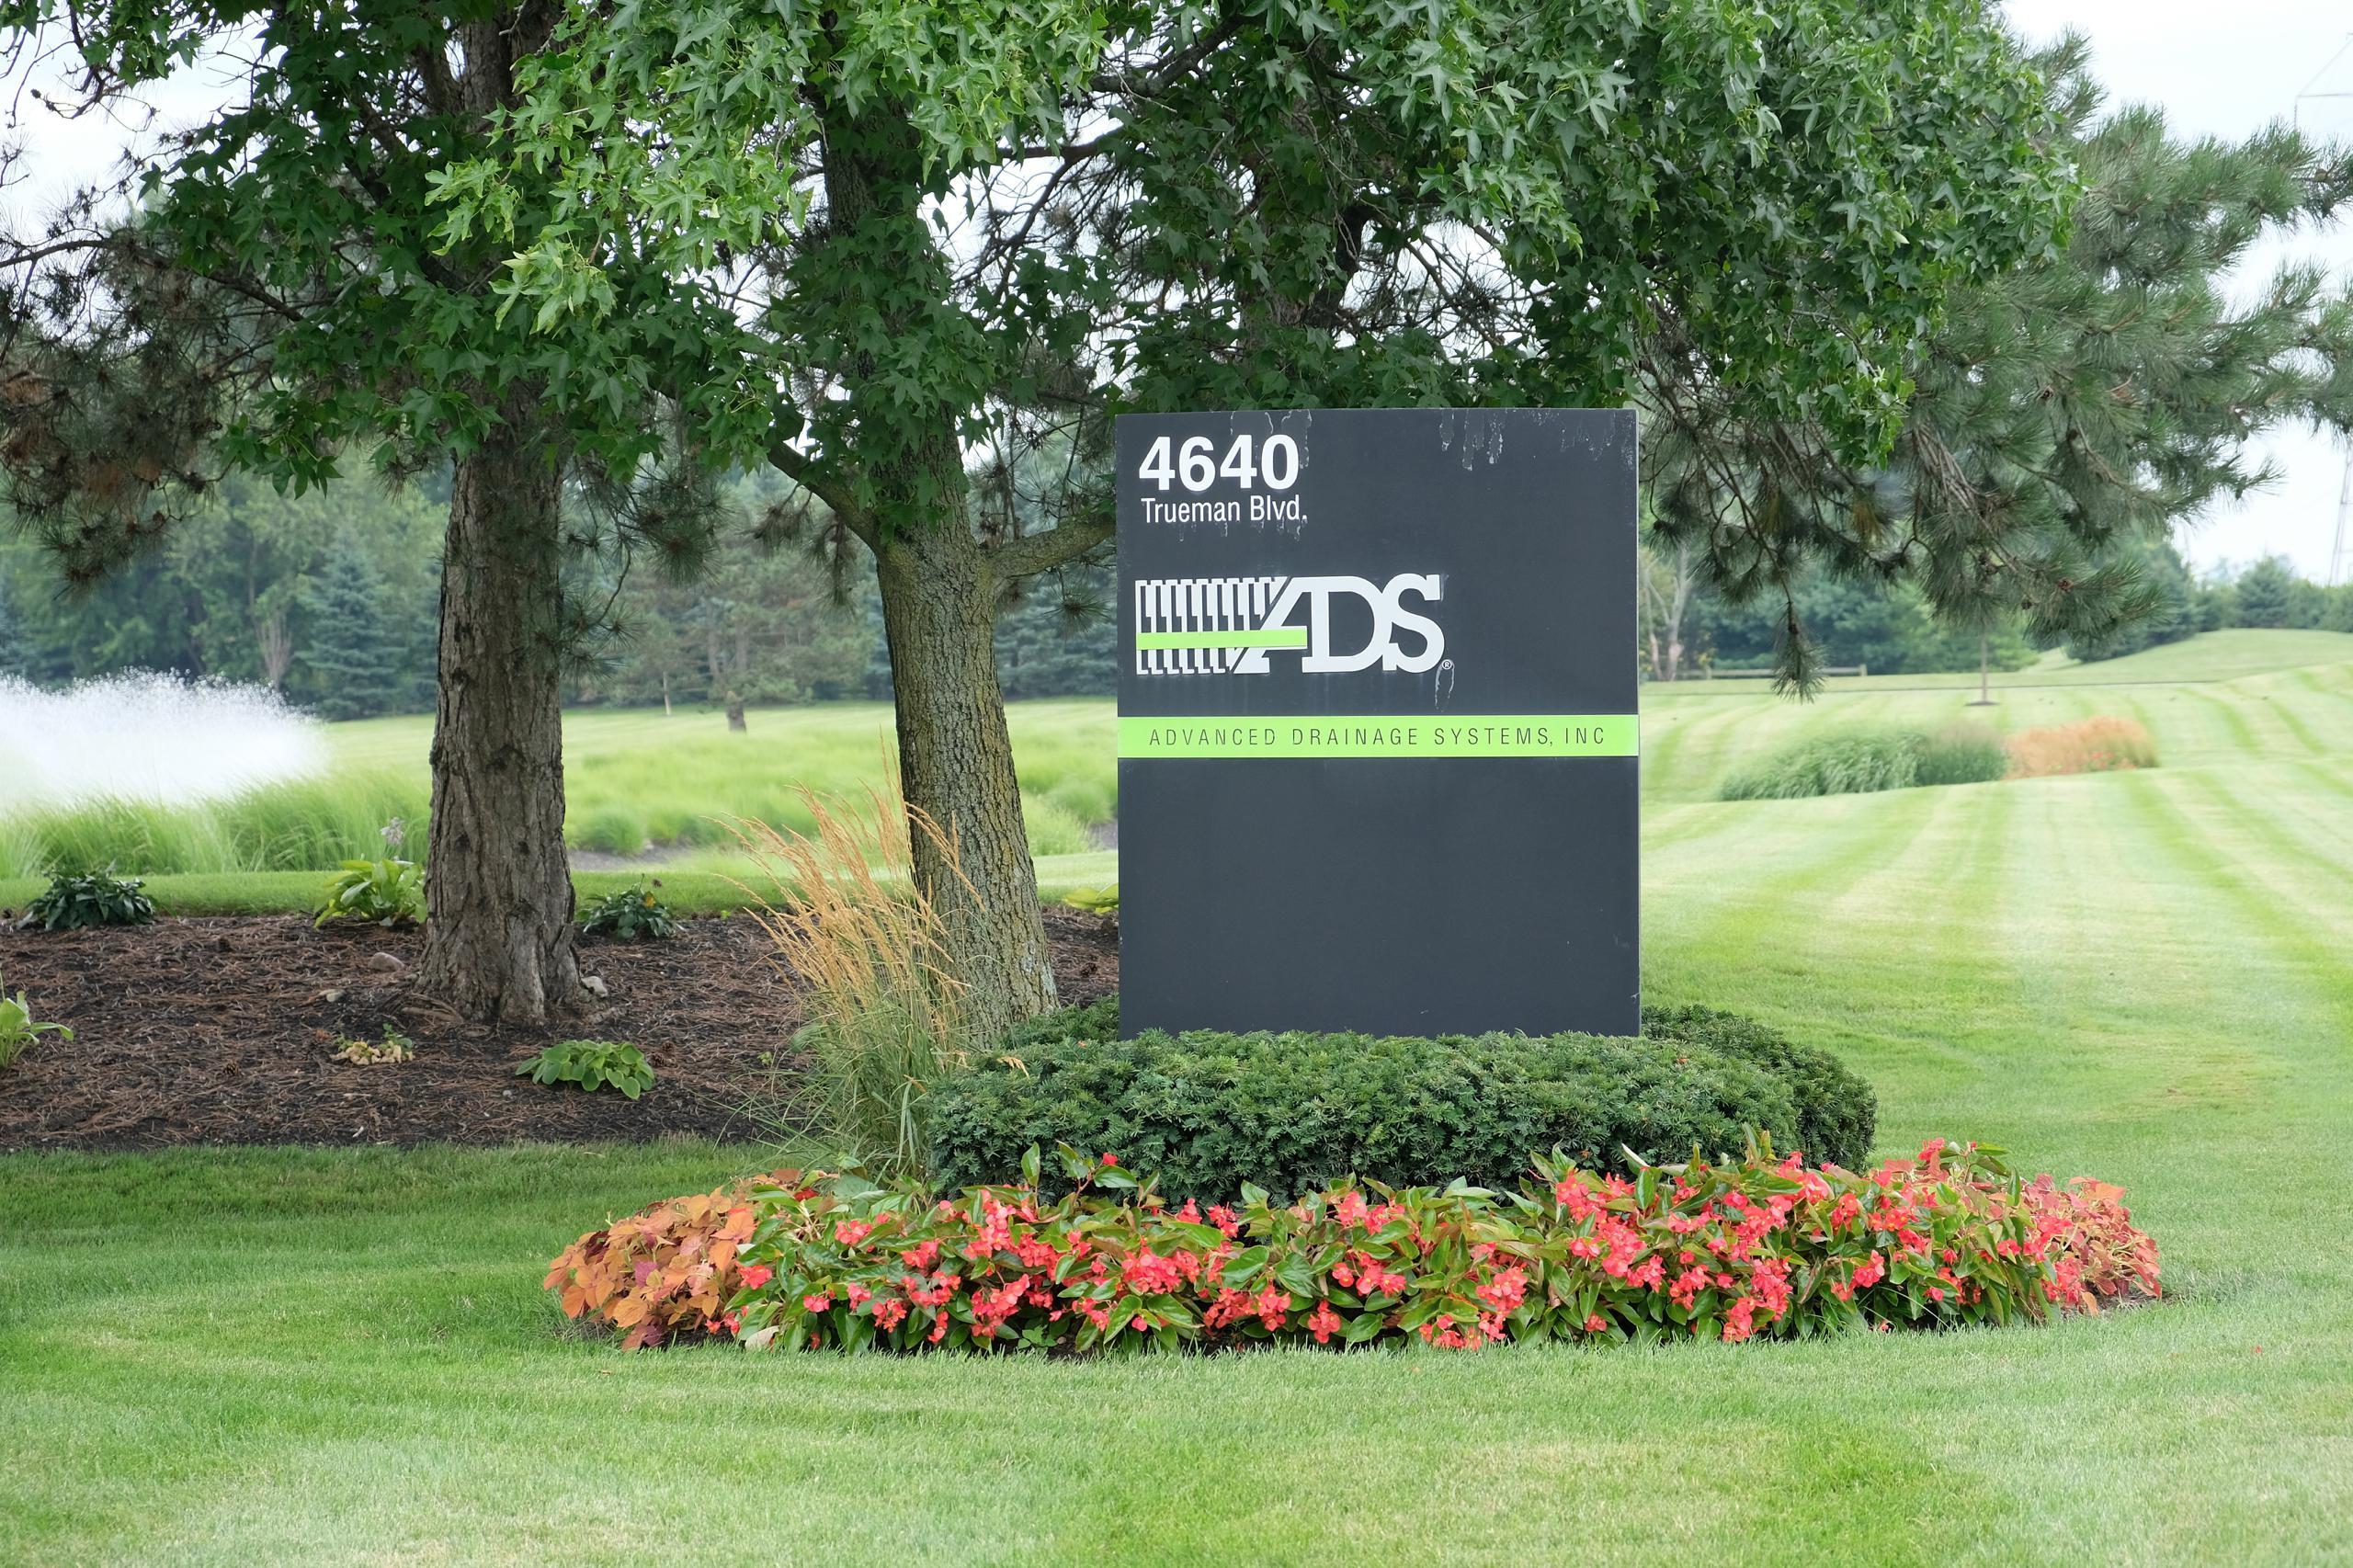 Entrance to Advanced Drainage Systems' corporate headquarters in Hilliard, Ohio.